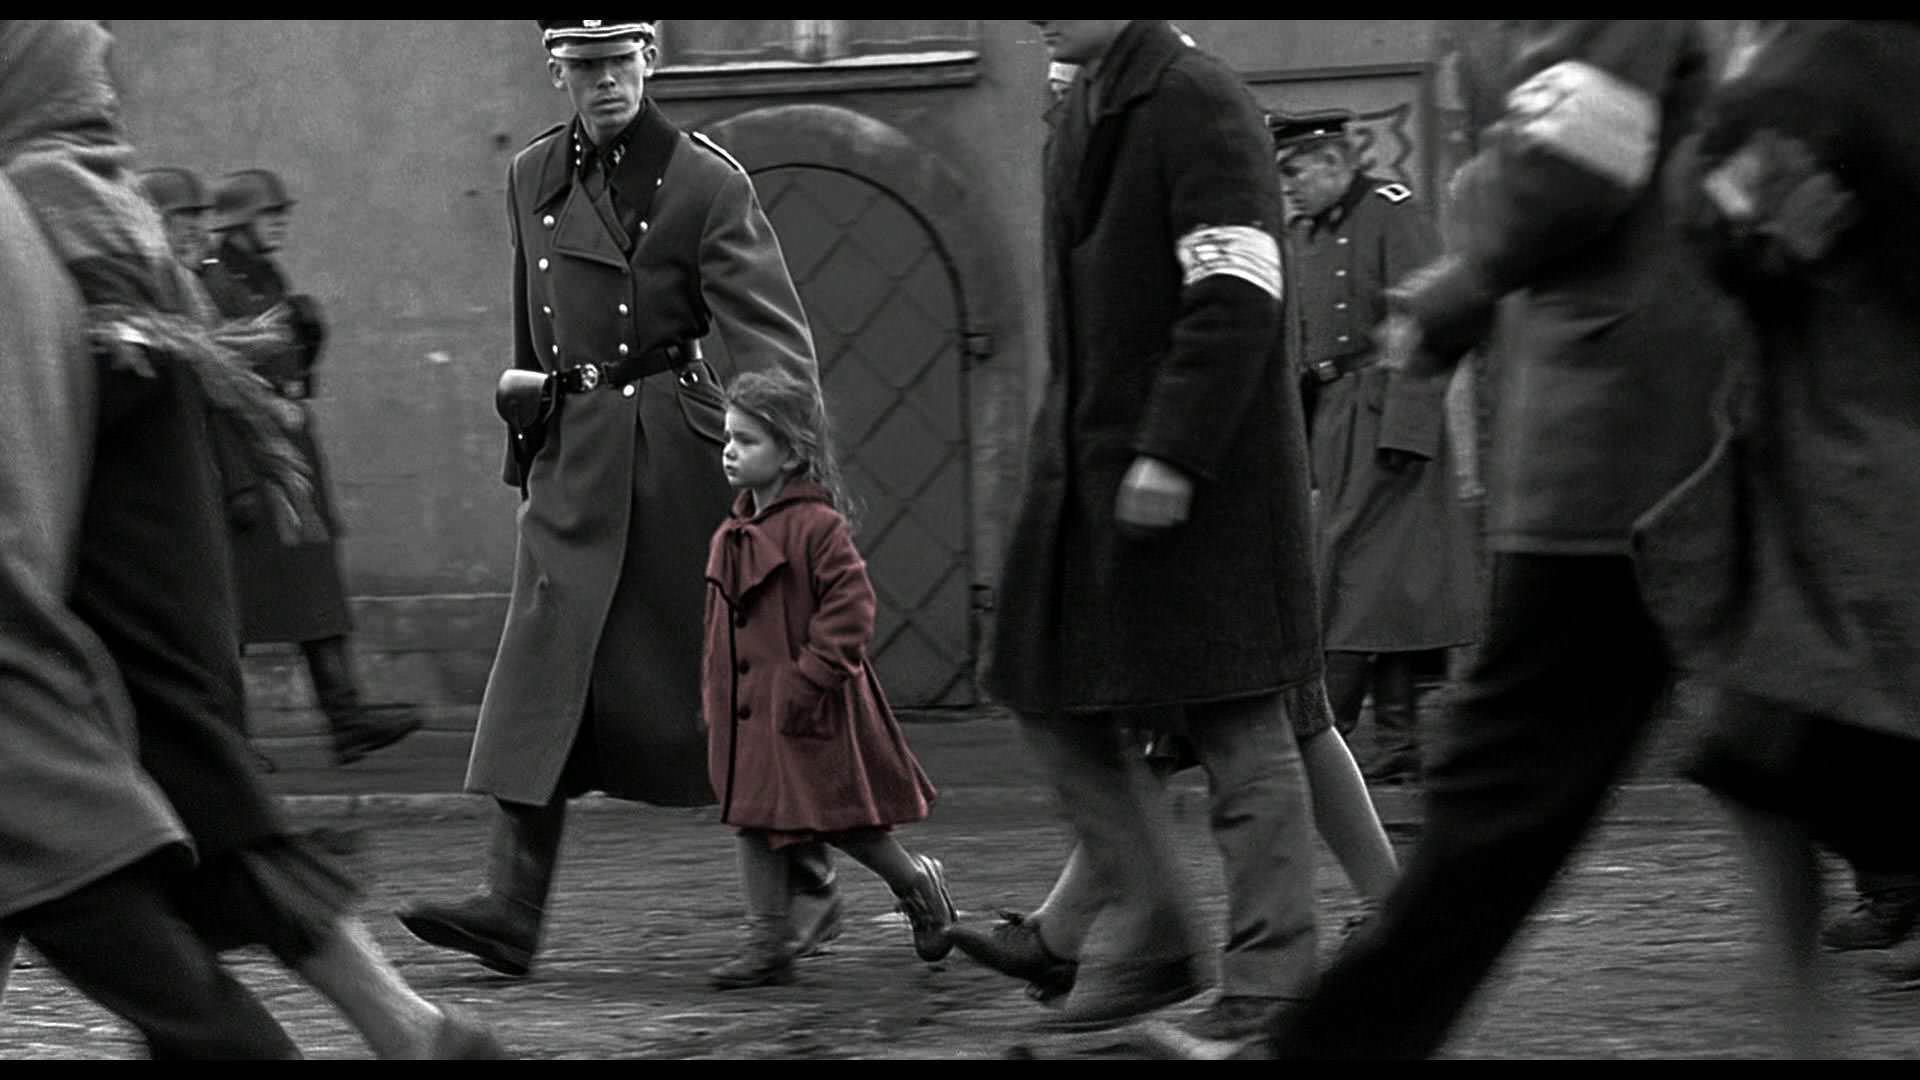 Schindler's List (1993) (Top 100 Films) - David Calhoun's blog